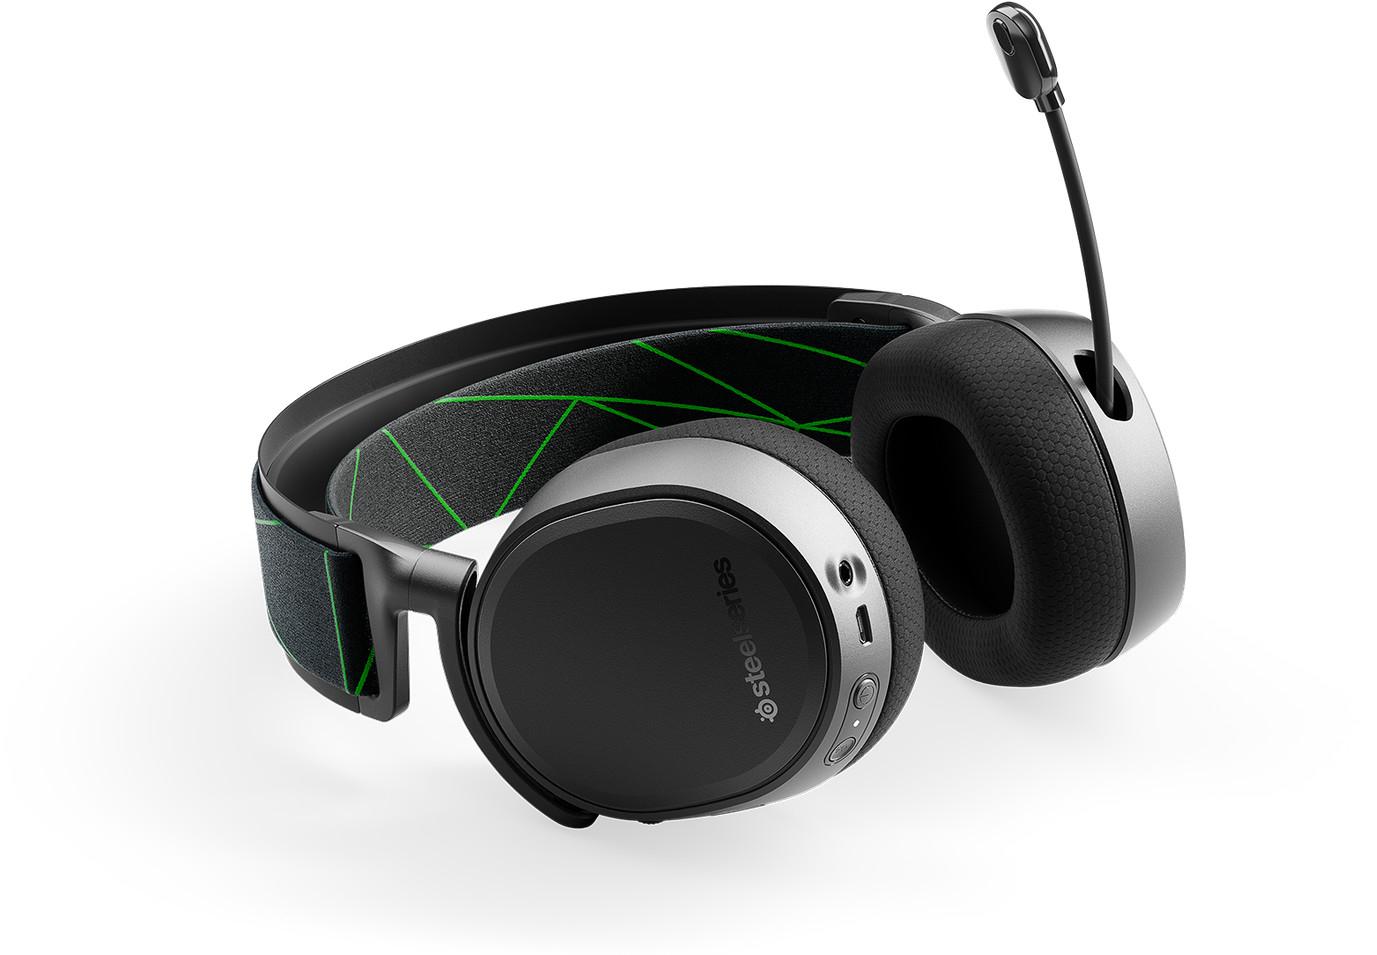 xbox wireless headset-comparison_table-m-3